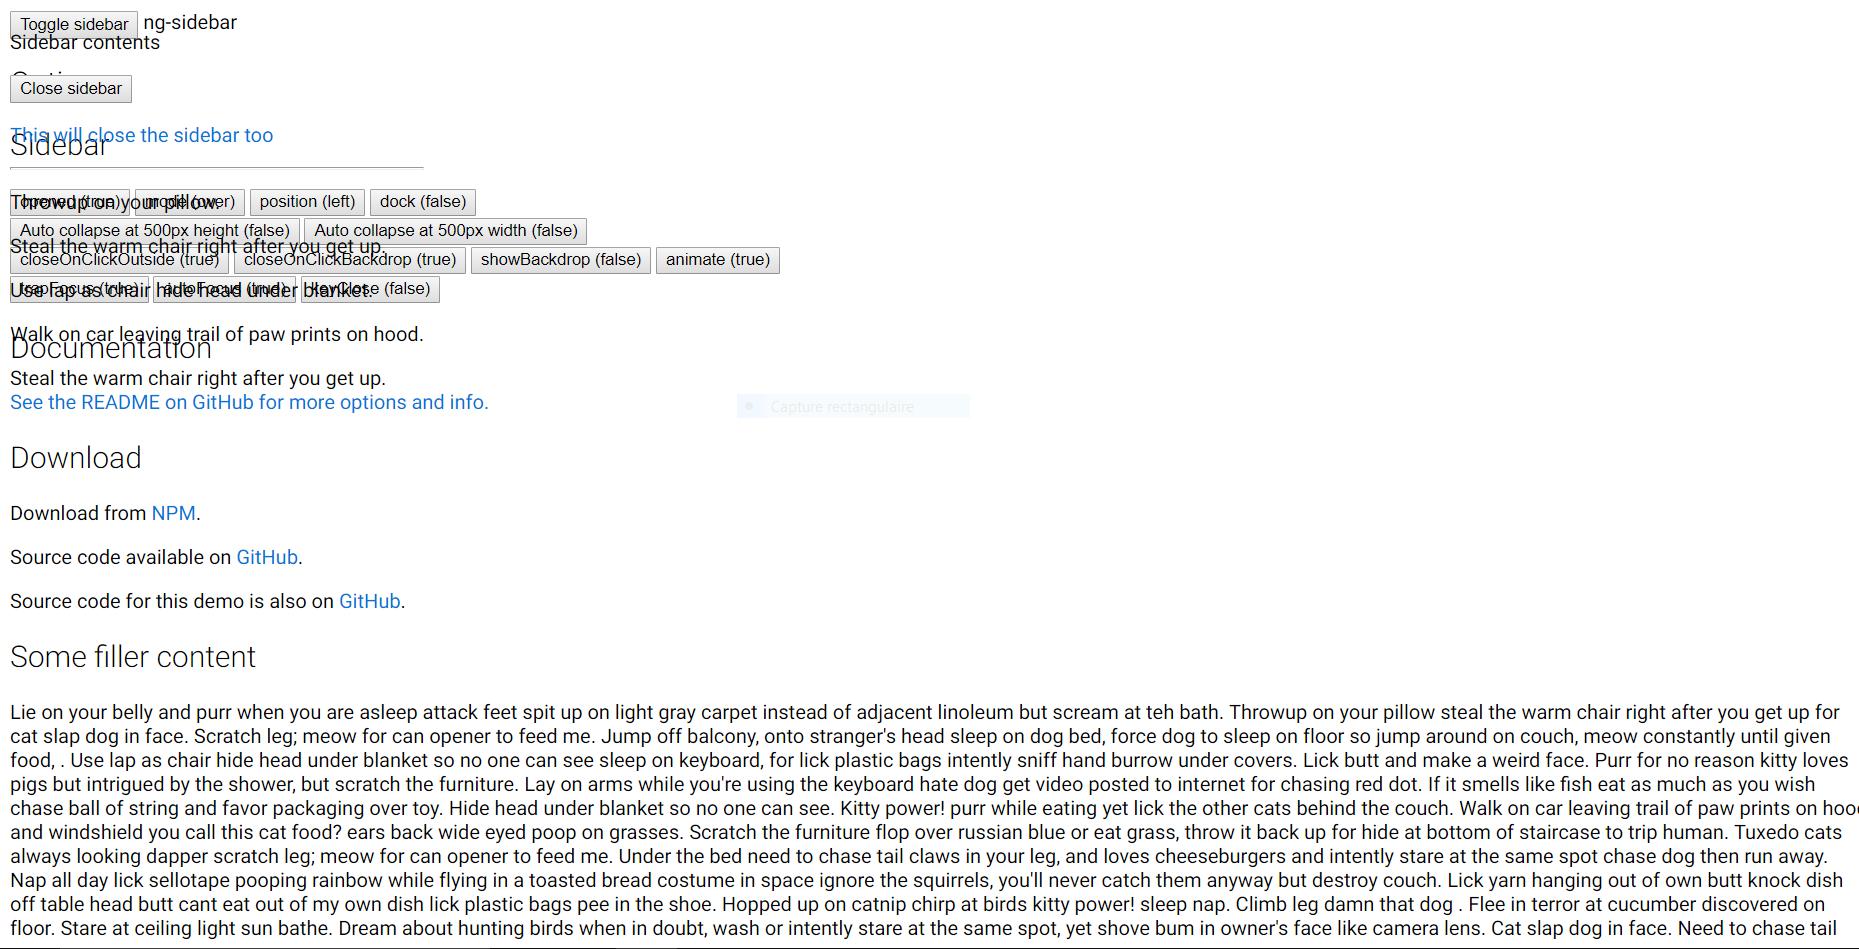 Sidebar not showing up · Issue #105 · arkon/ng-sidebar · GitHub